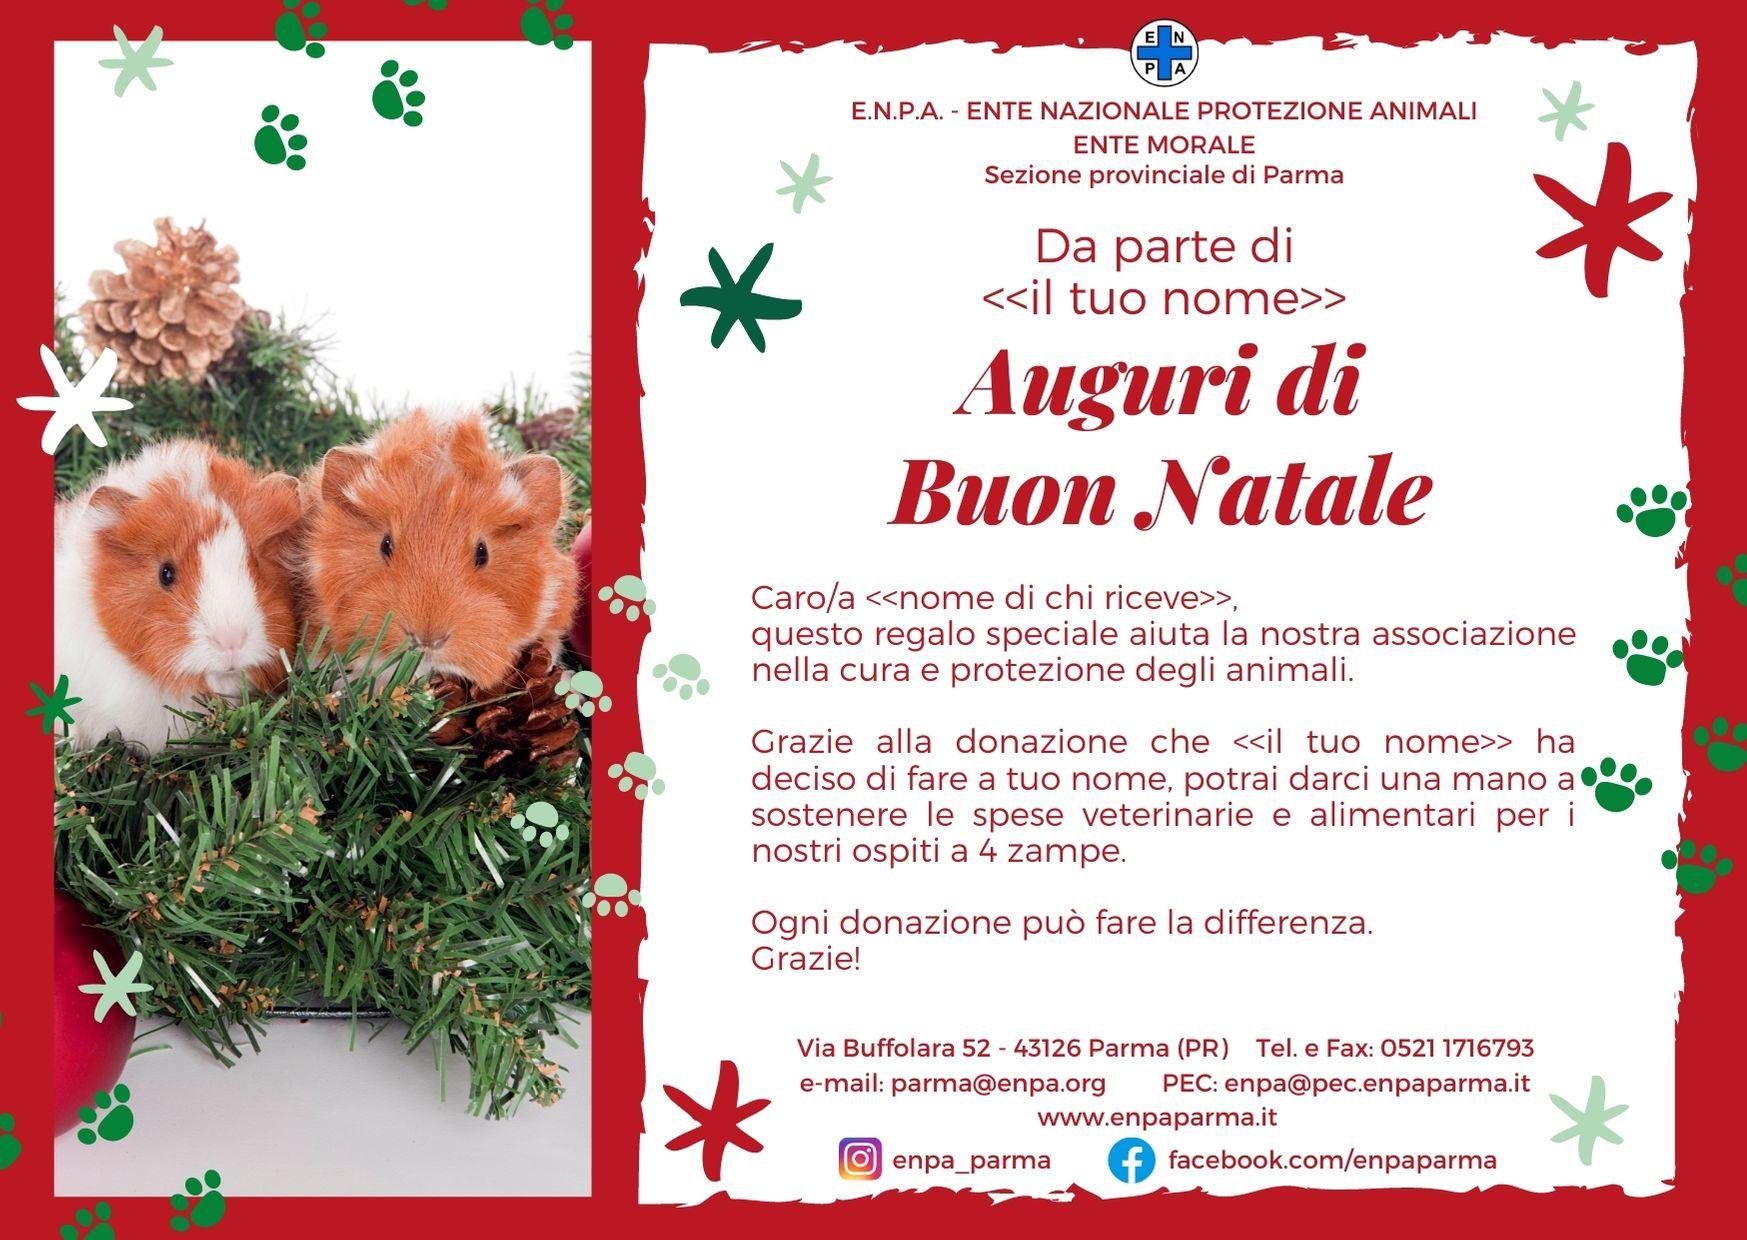 Natale Con ENPA (cavie - 5€)